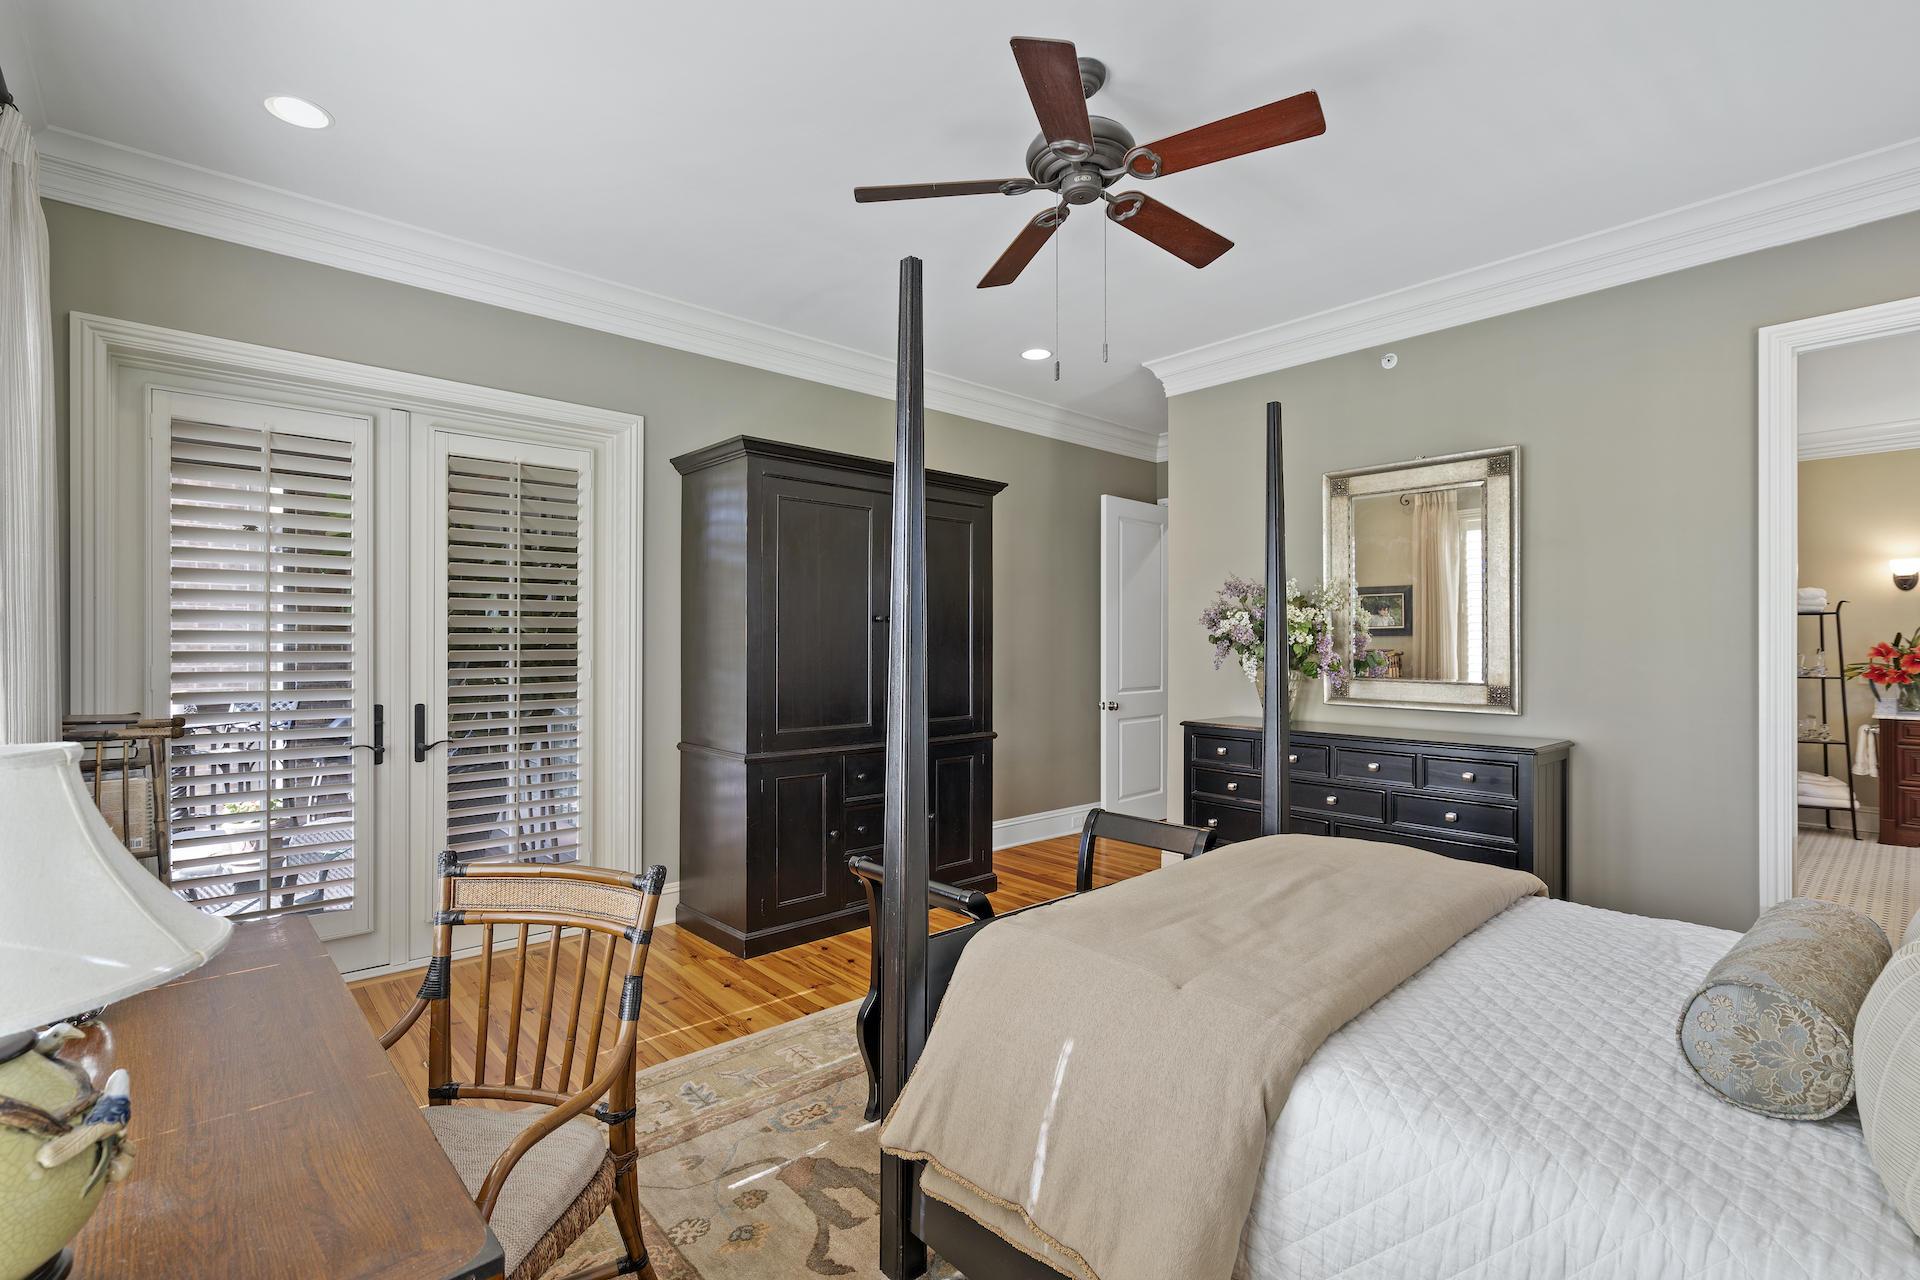 Daniel Island Homes For Sale - 250 Island Park, Charleston, SC - 2